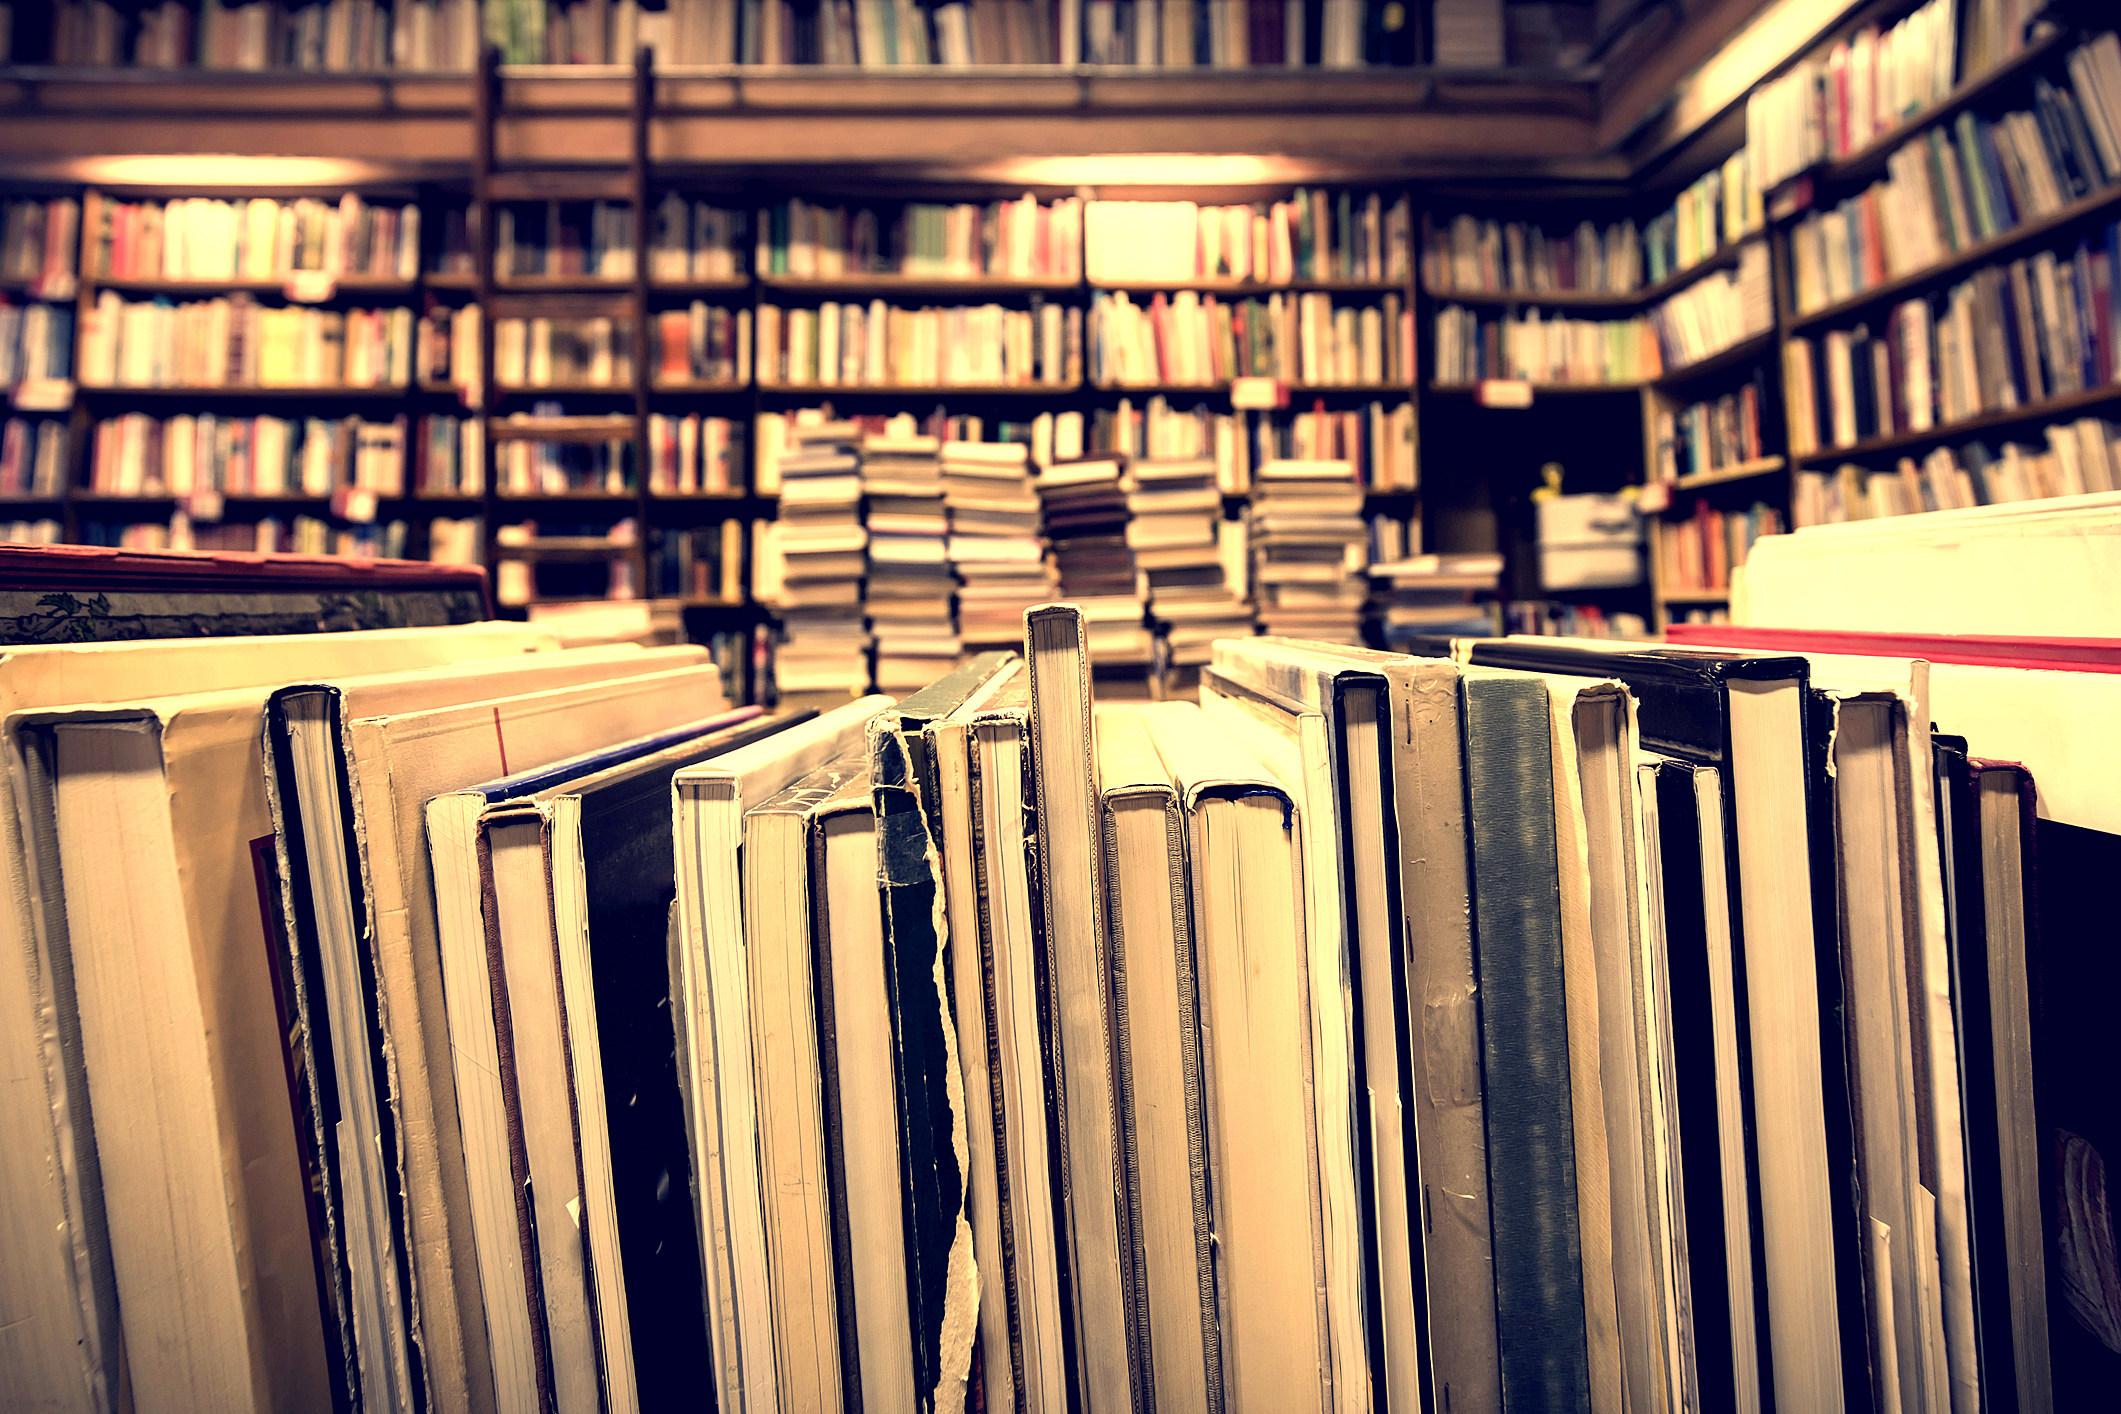 books in second-hand bookshop